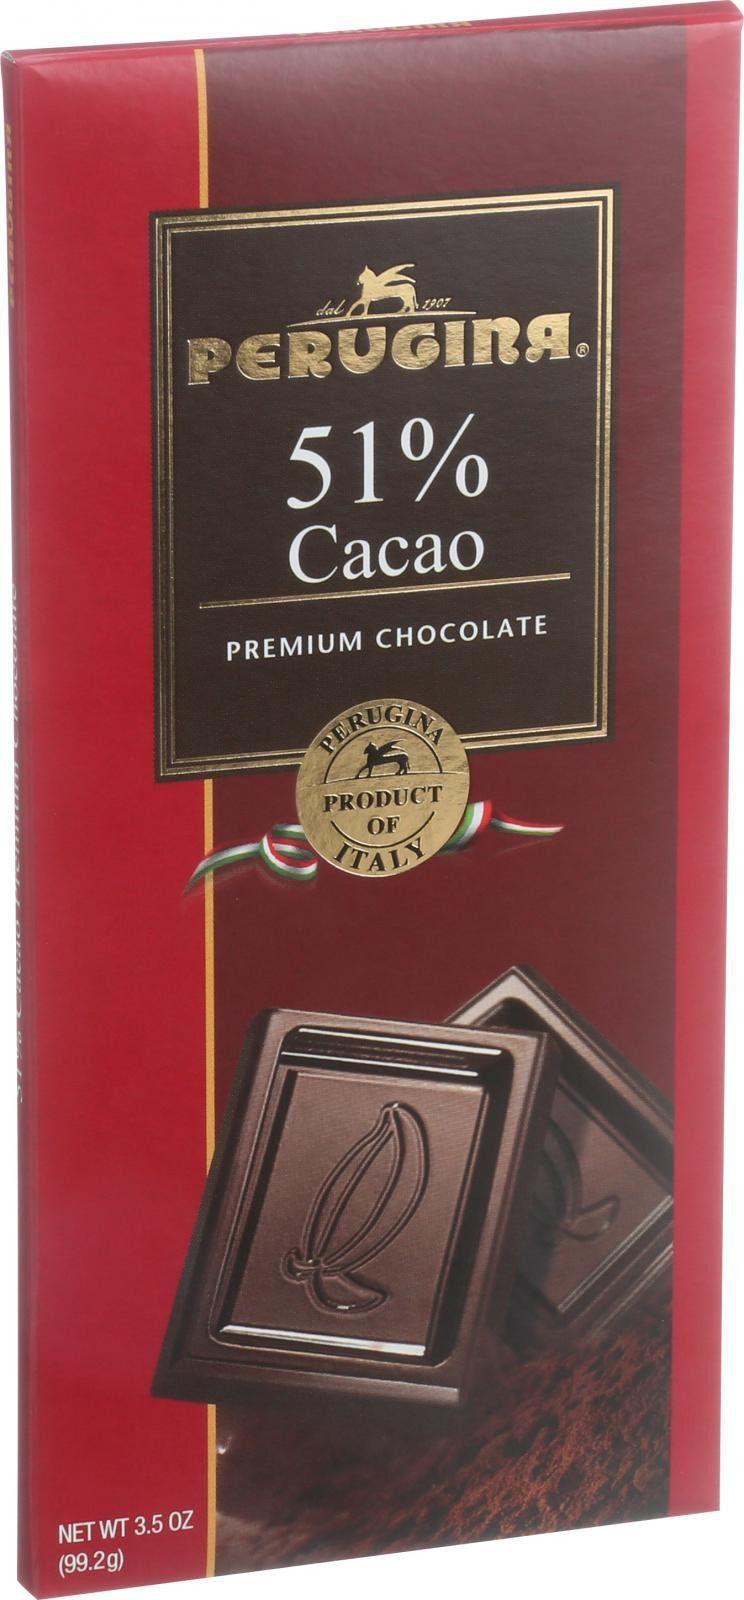 Perugina Chocolate Bar Dark Chocolate 3 5 Oz Bars Case Of 12 Dark Chocolate Chocolate Premium Chocolate